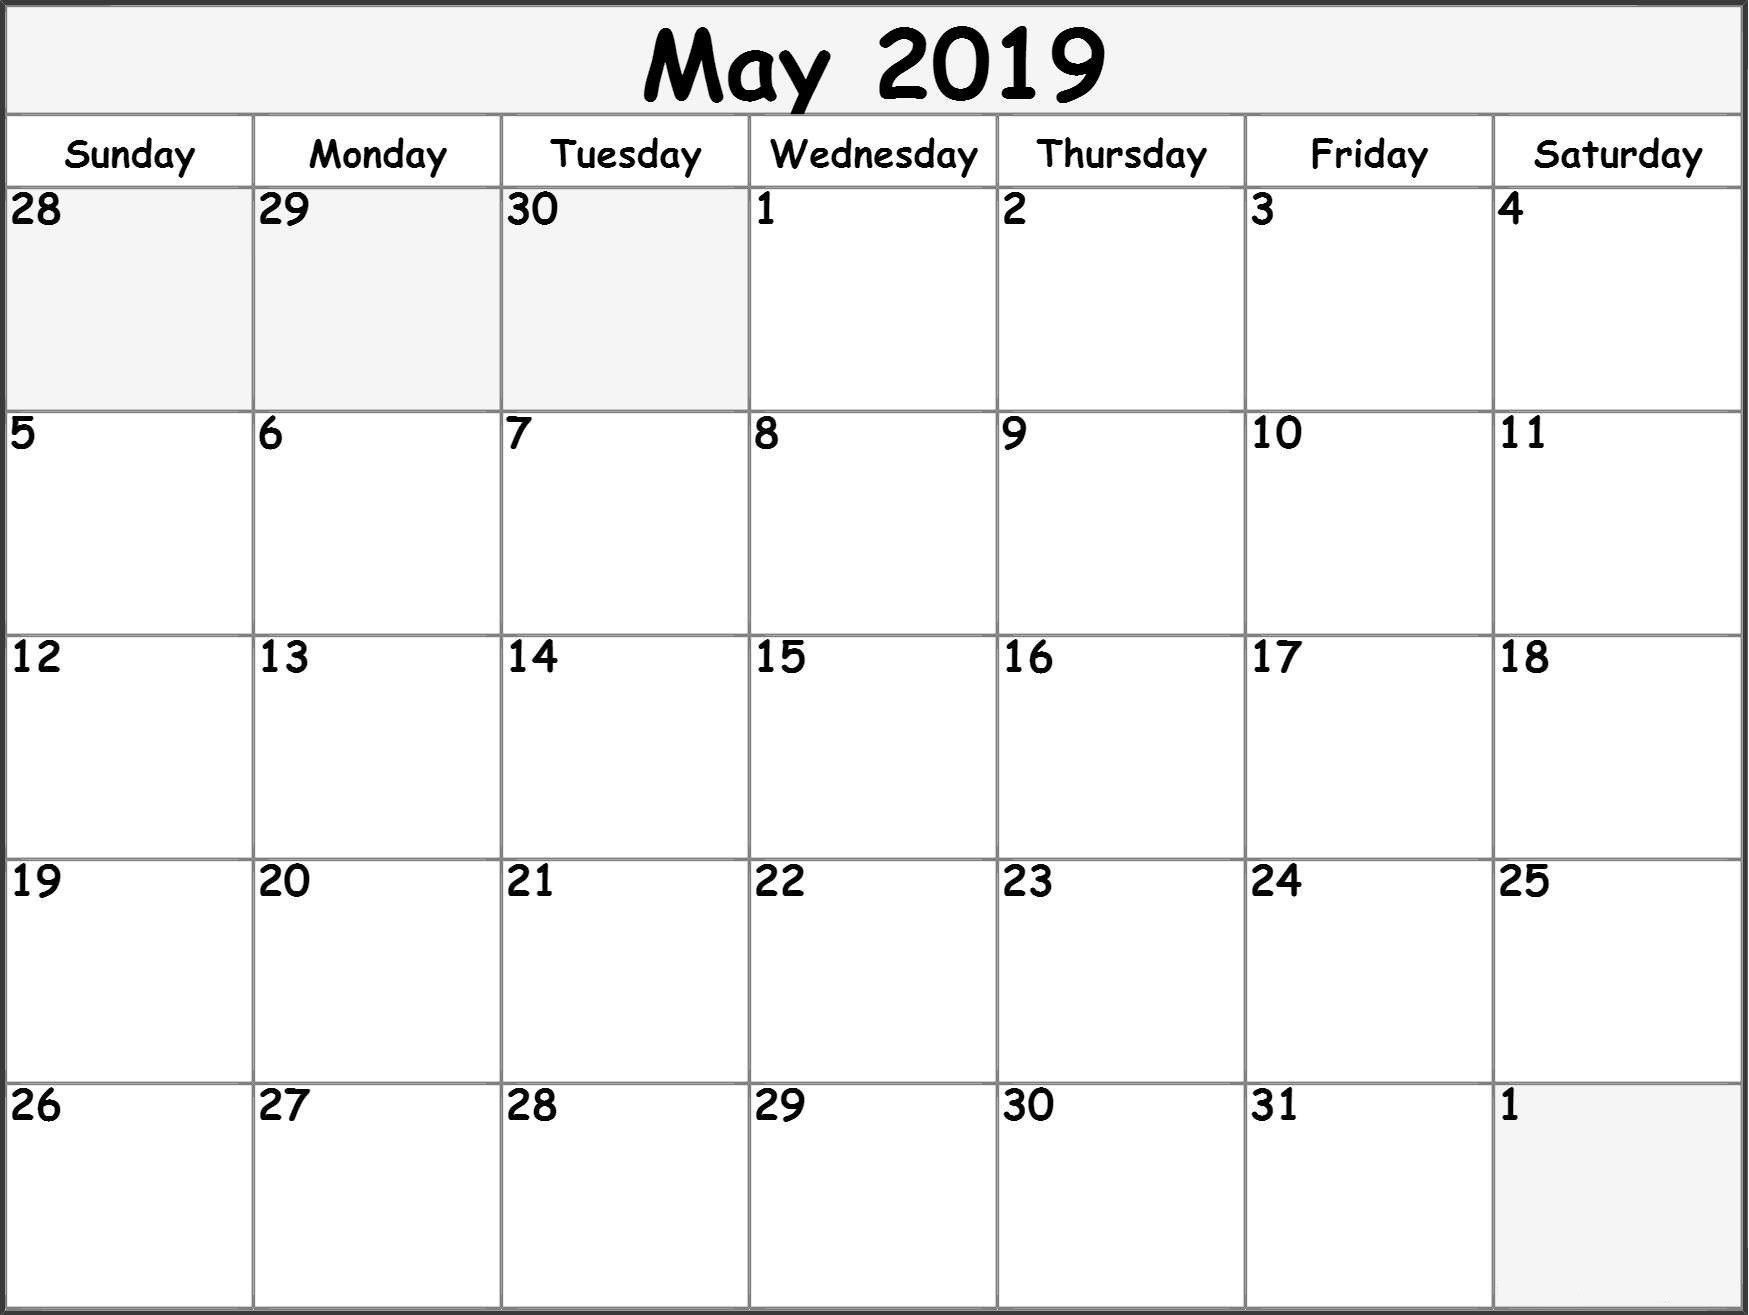 Free May 2019 Printable Calendar Word Pdf With Holidays Calendar